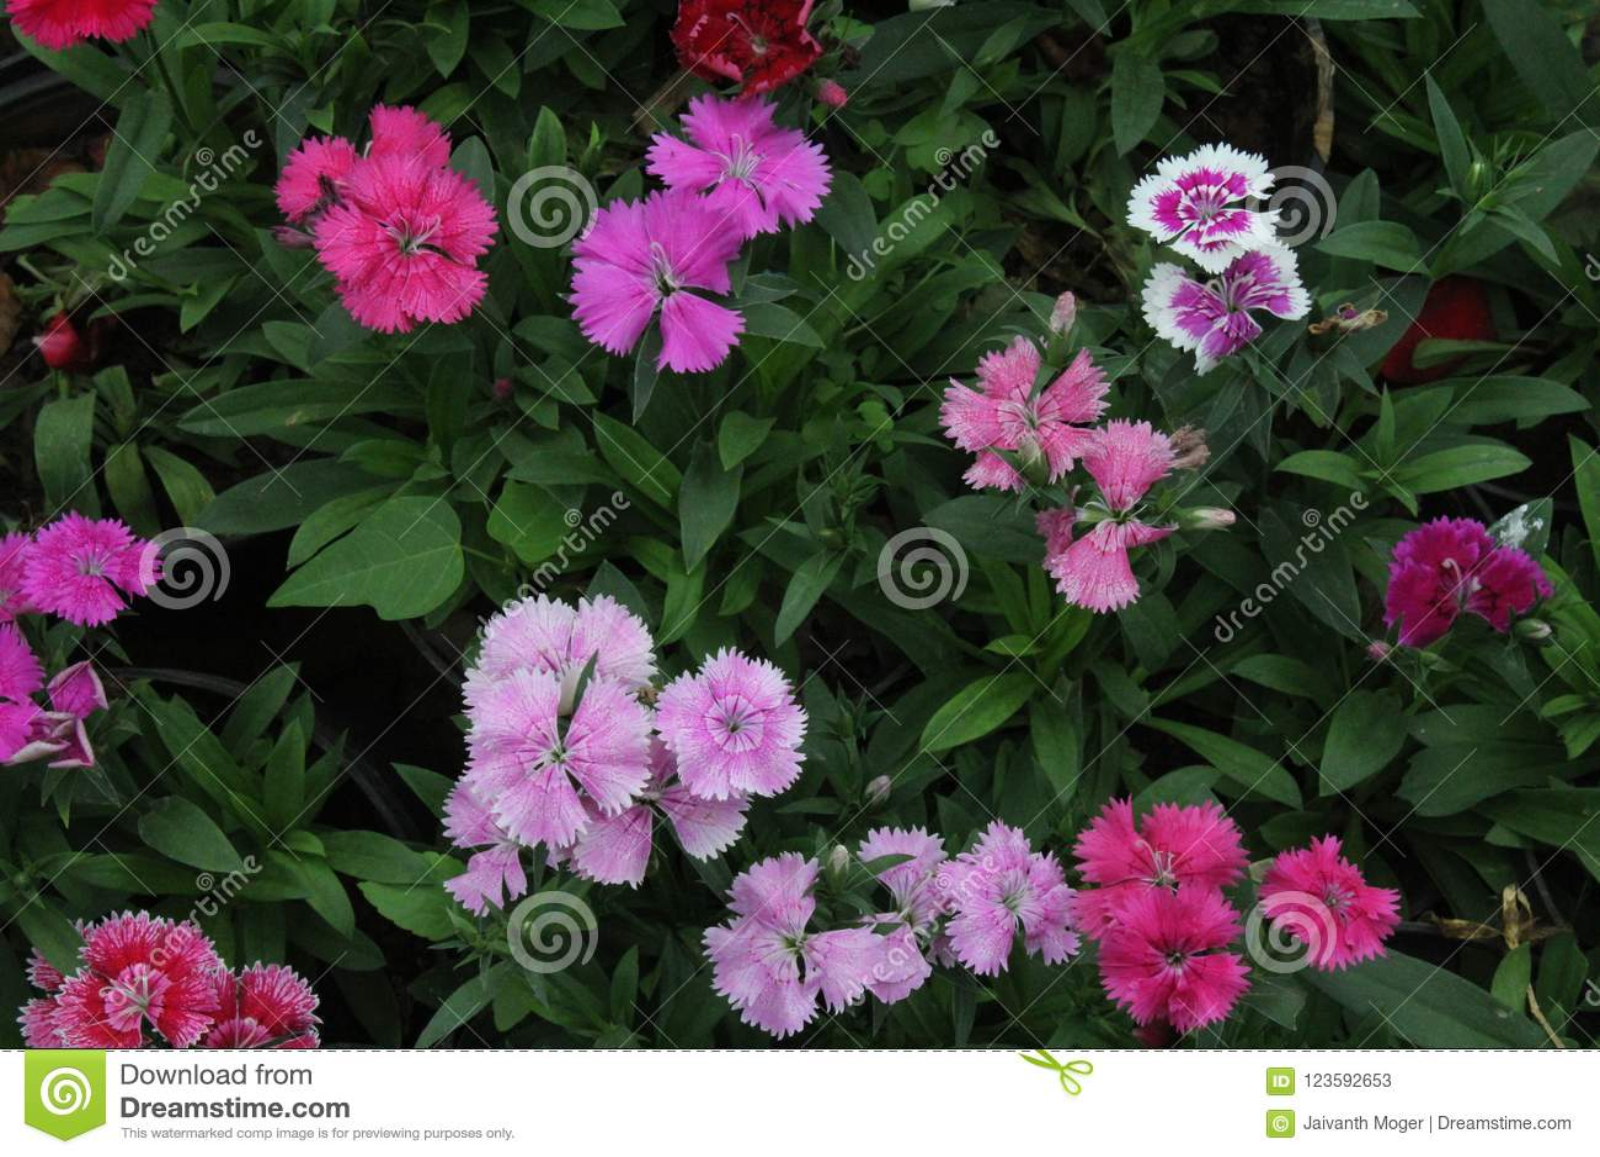 Colourful Flowers Desktop Mobile Wallpaper Background Stock Image